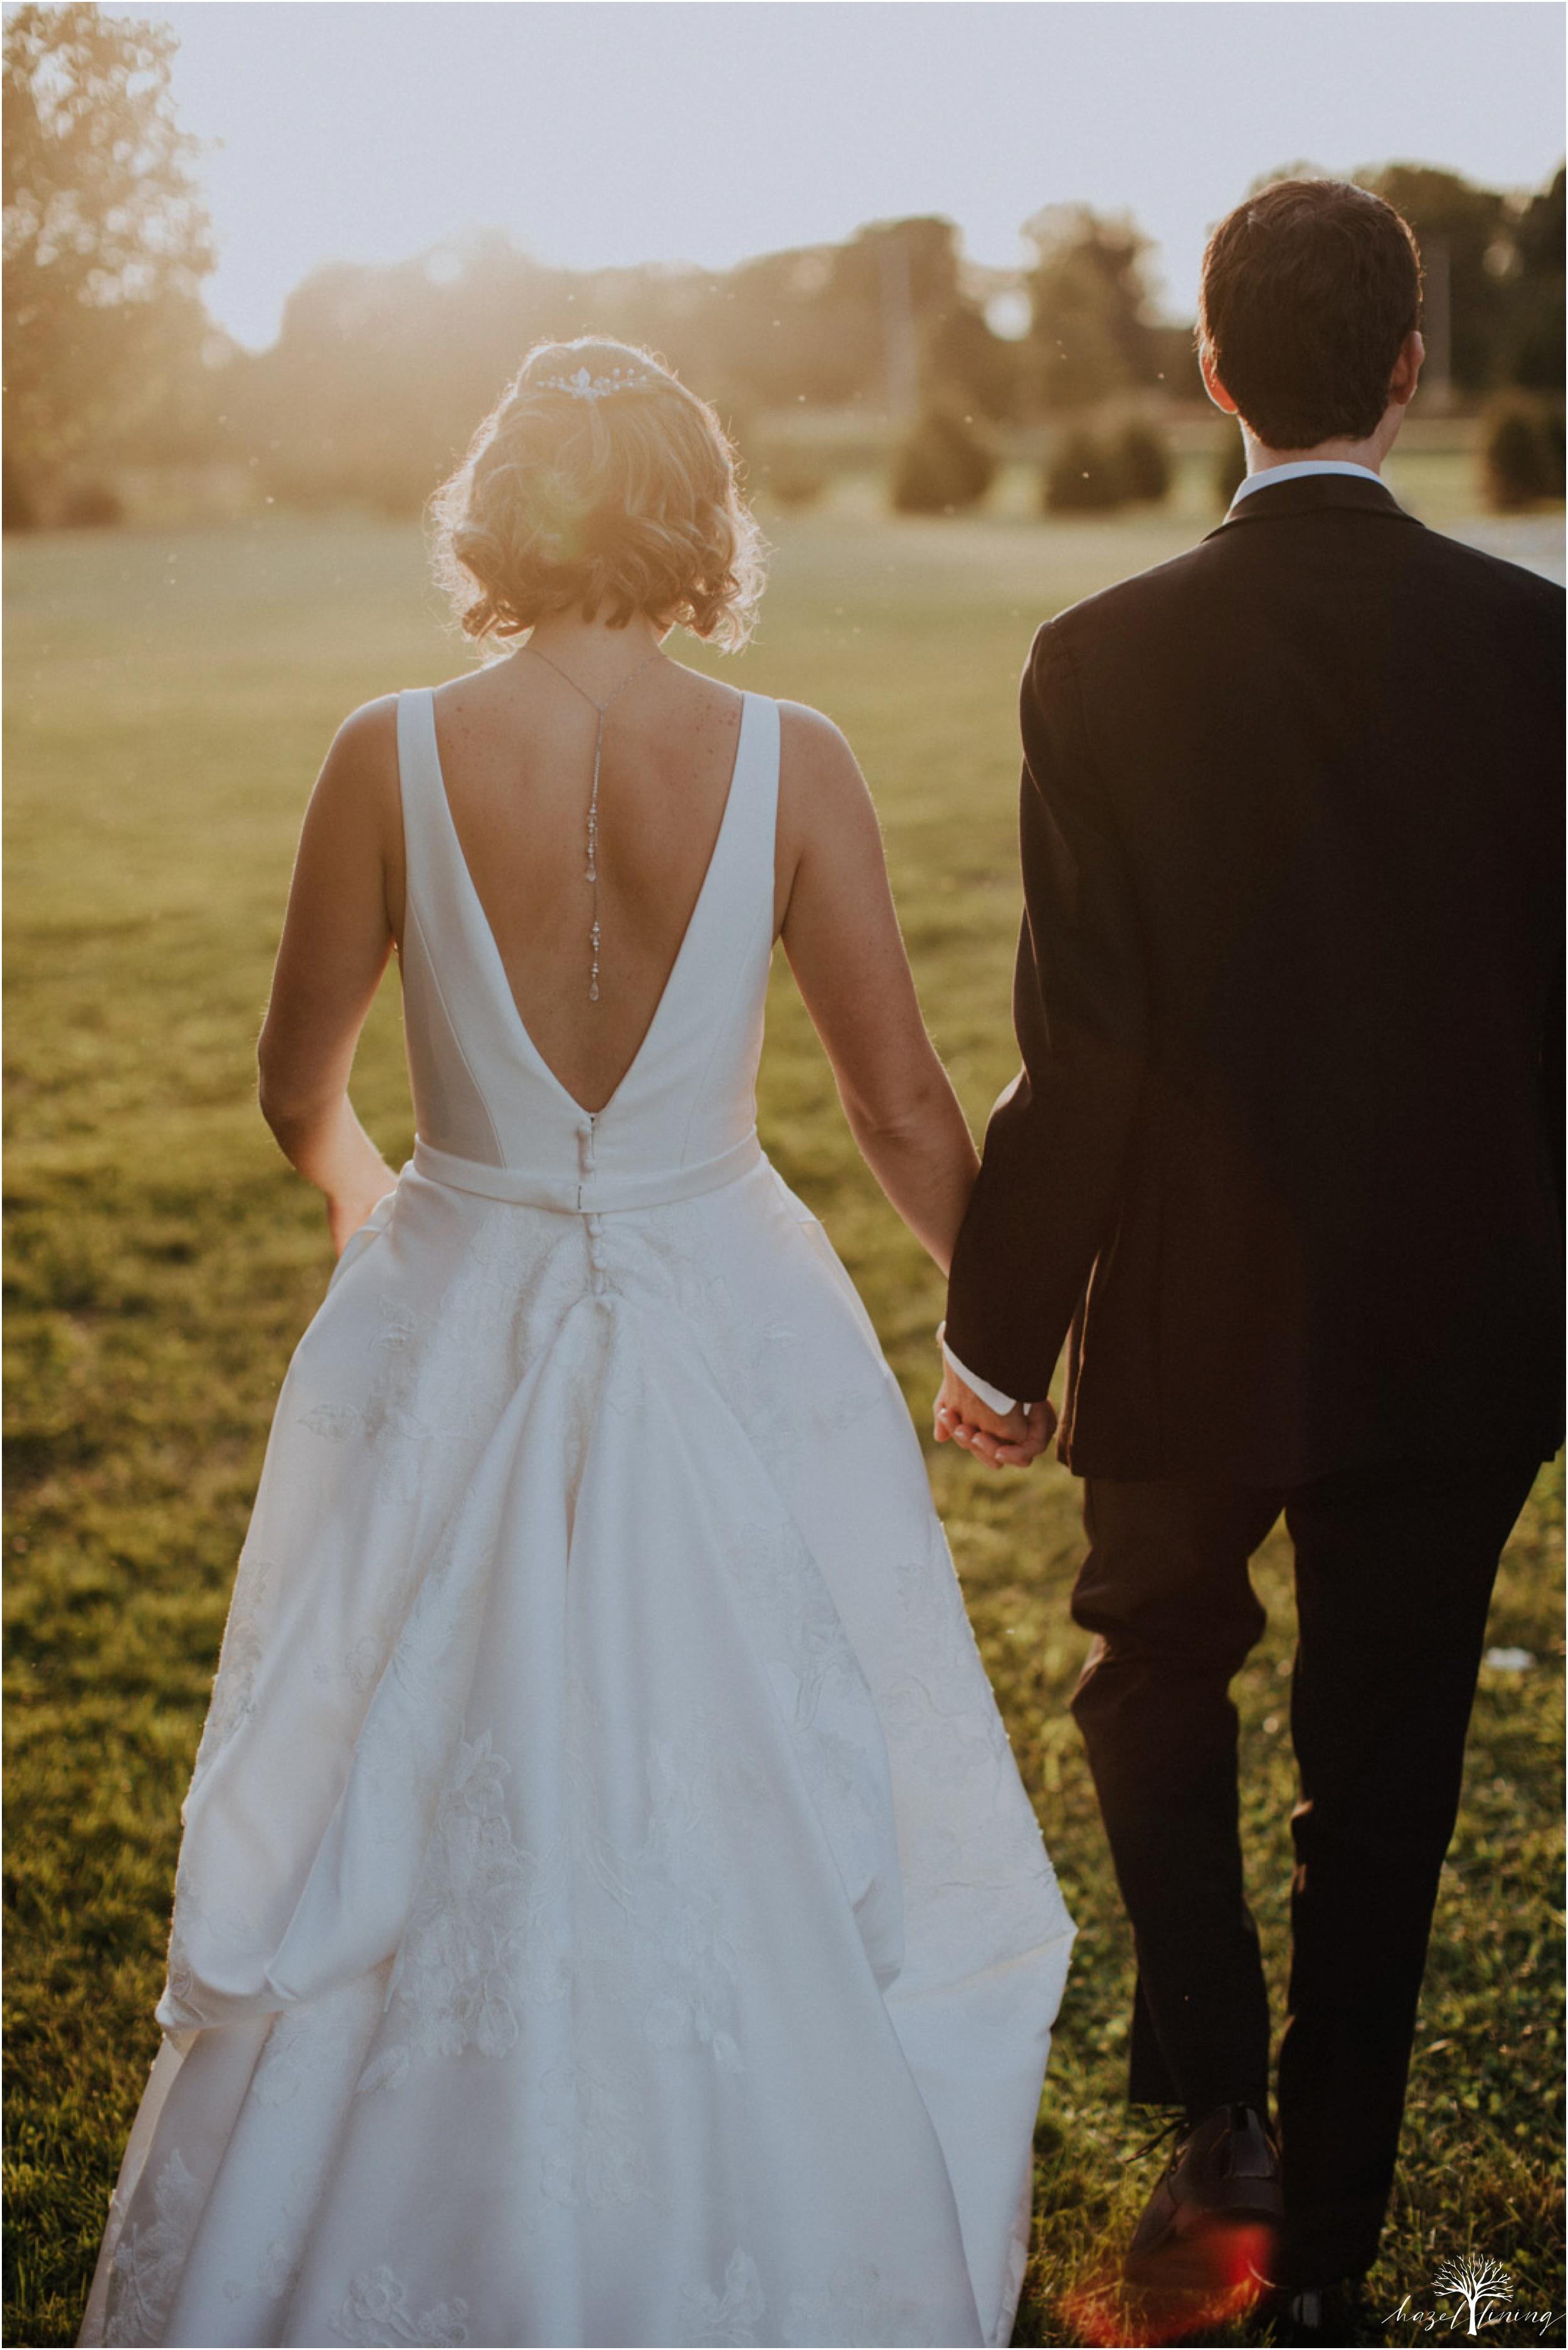 maureen-hepner-anthony-giordano-rose-bank-winery-newtow-pennsylvania-luxury-summer-wedding-hazel-lining-photography-destination-elopement-wedding-engagement-photography_0165.jpg